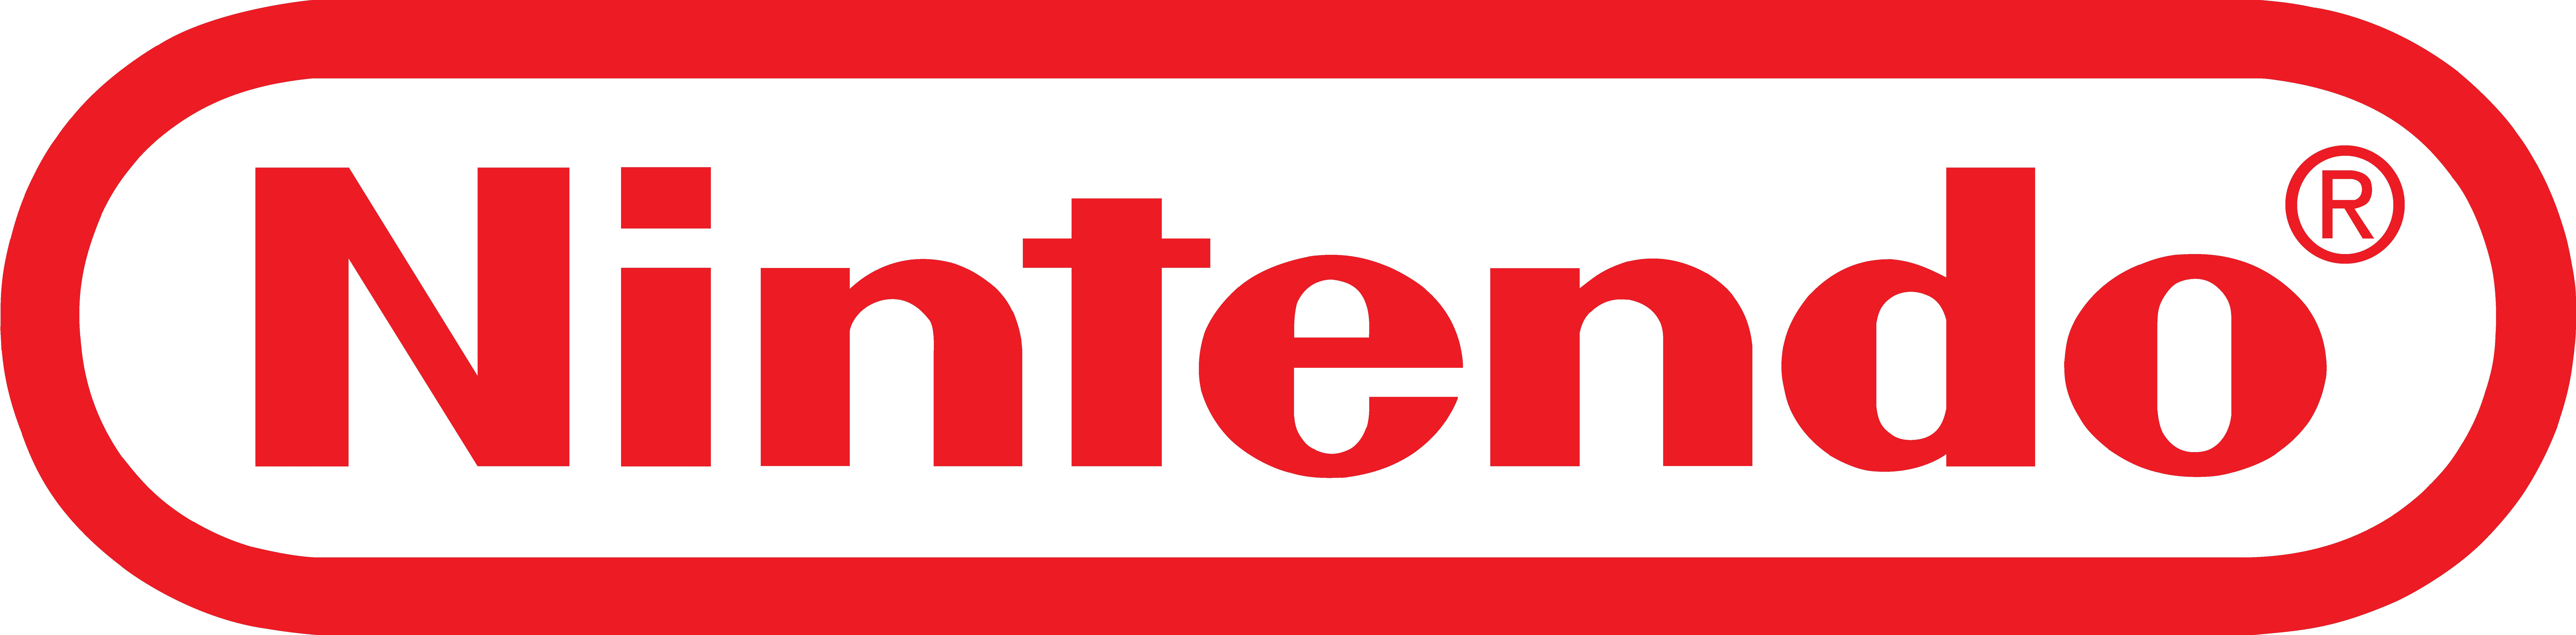 with speedpaint nintendo logo vector by windytheplaneh on deviantart rh deviantart com super nintendo logo vector nintendo logo vectorizado